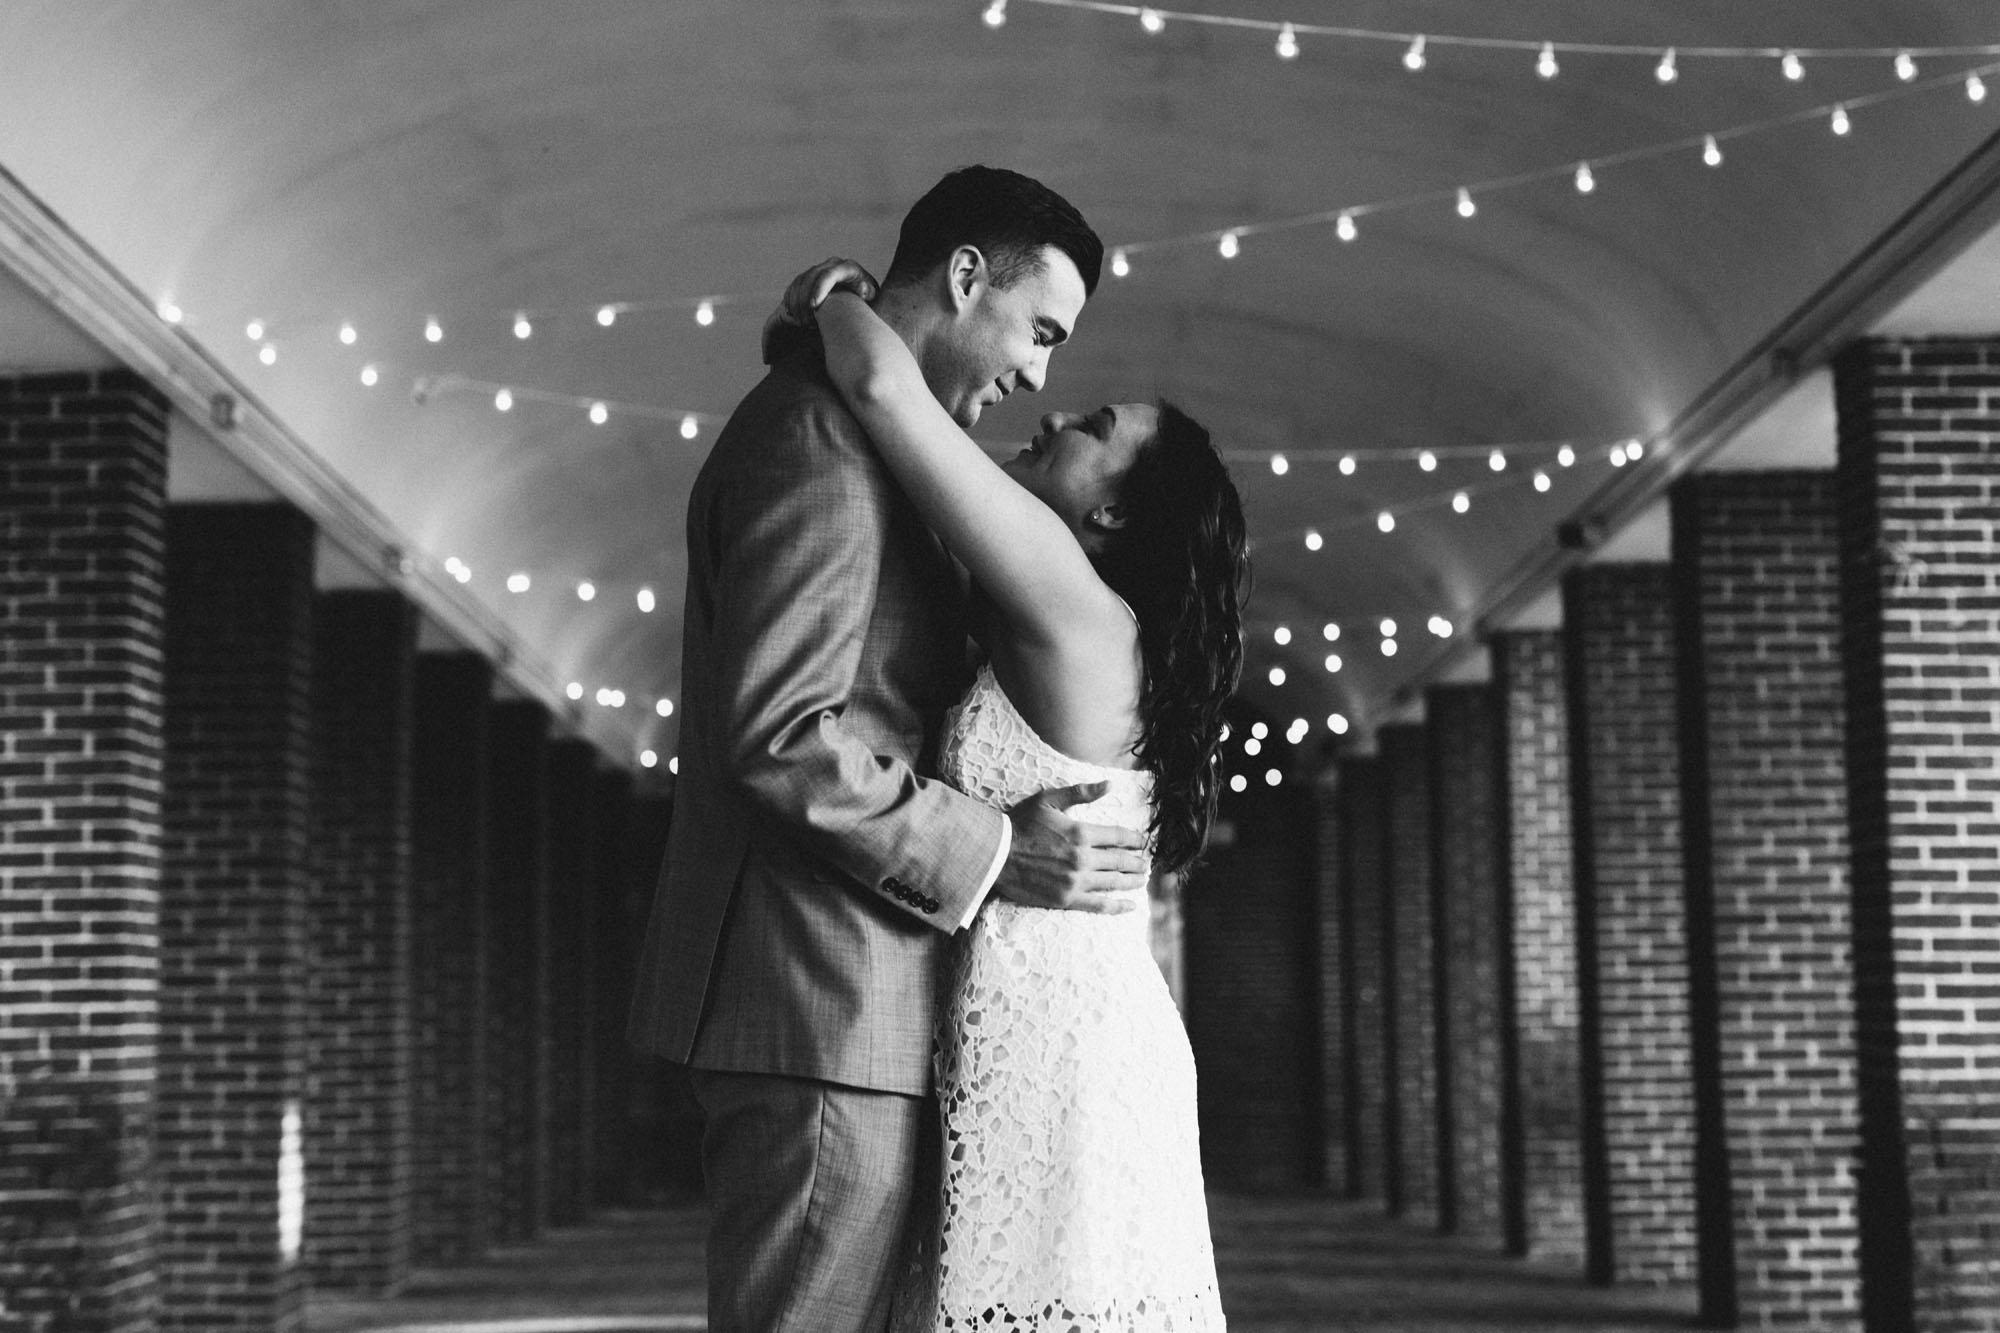 Twisted-Oaks-Studio-Shannon-Billy-Engagement-3.jpg